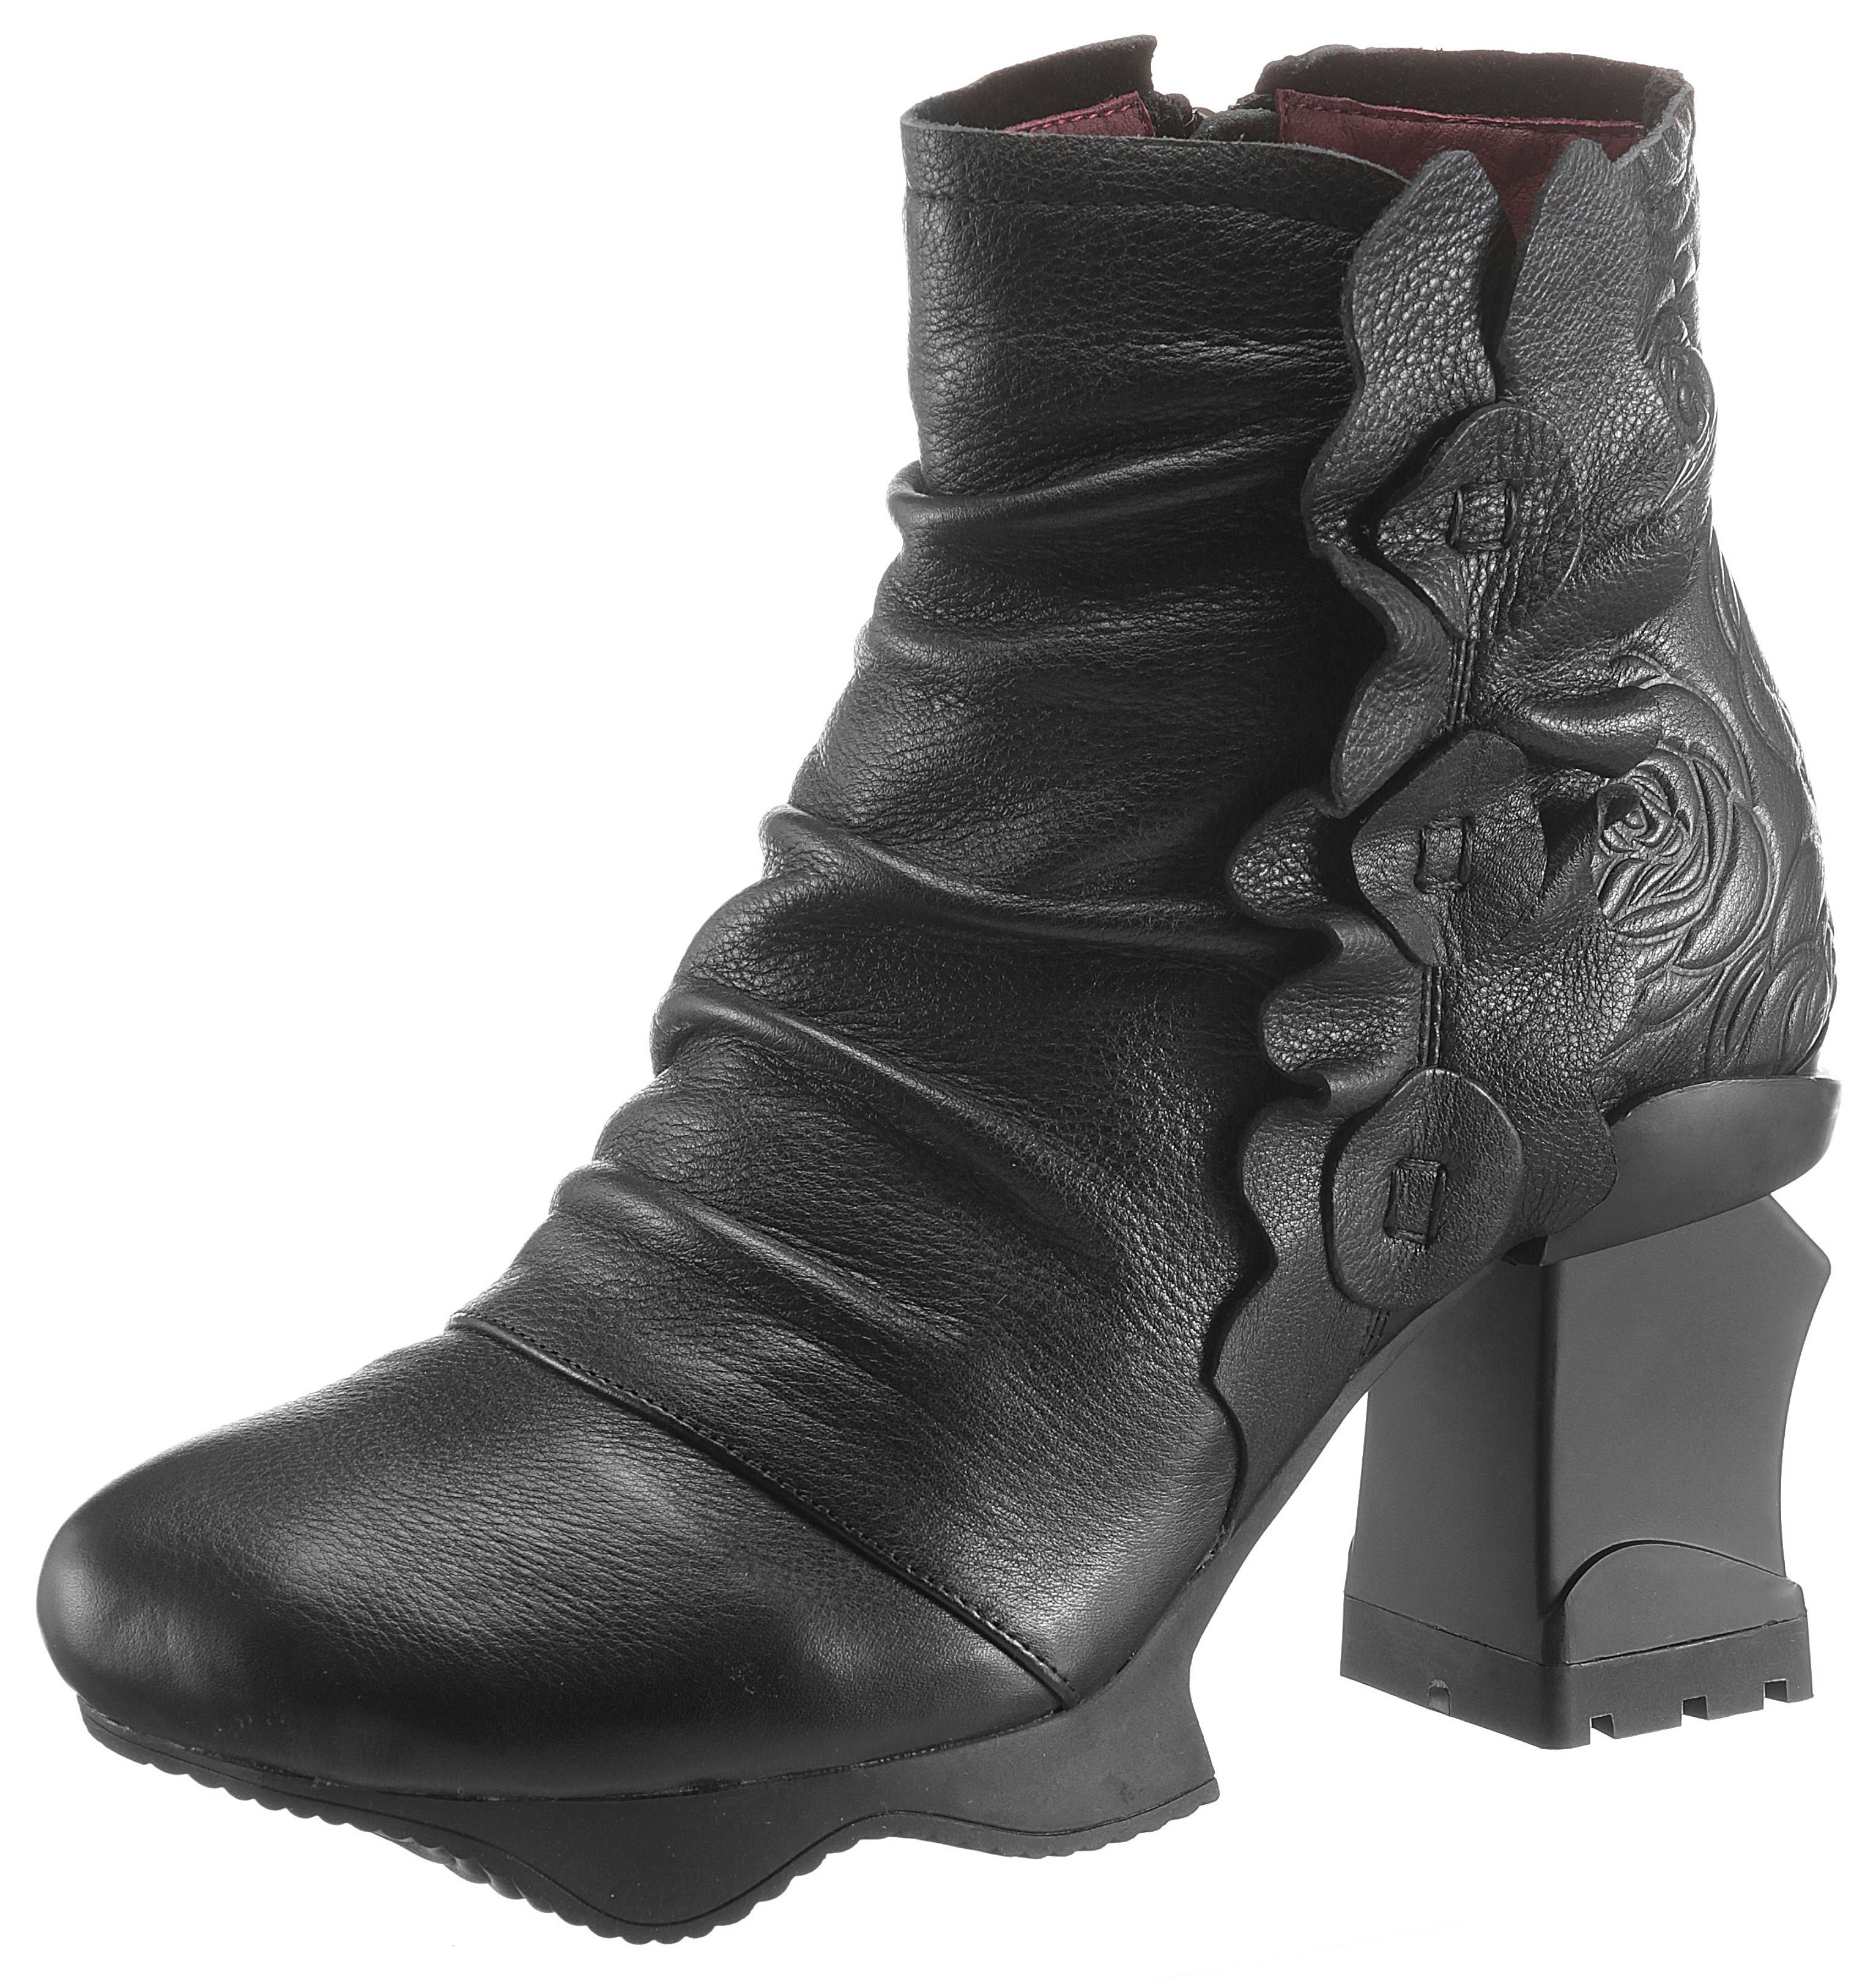 LAURA VITA Plateaustiefelette | Schuhe > Stiefeletten > Plateaustiefeletten | laura vita